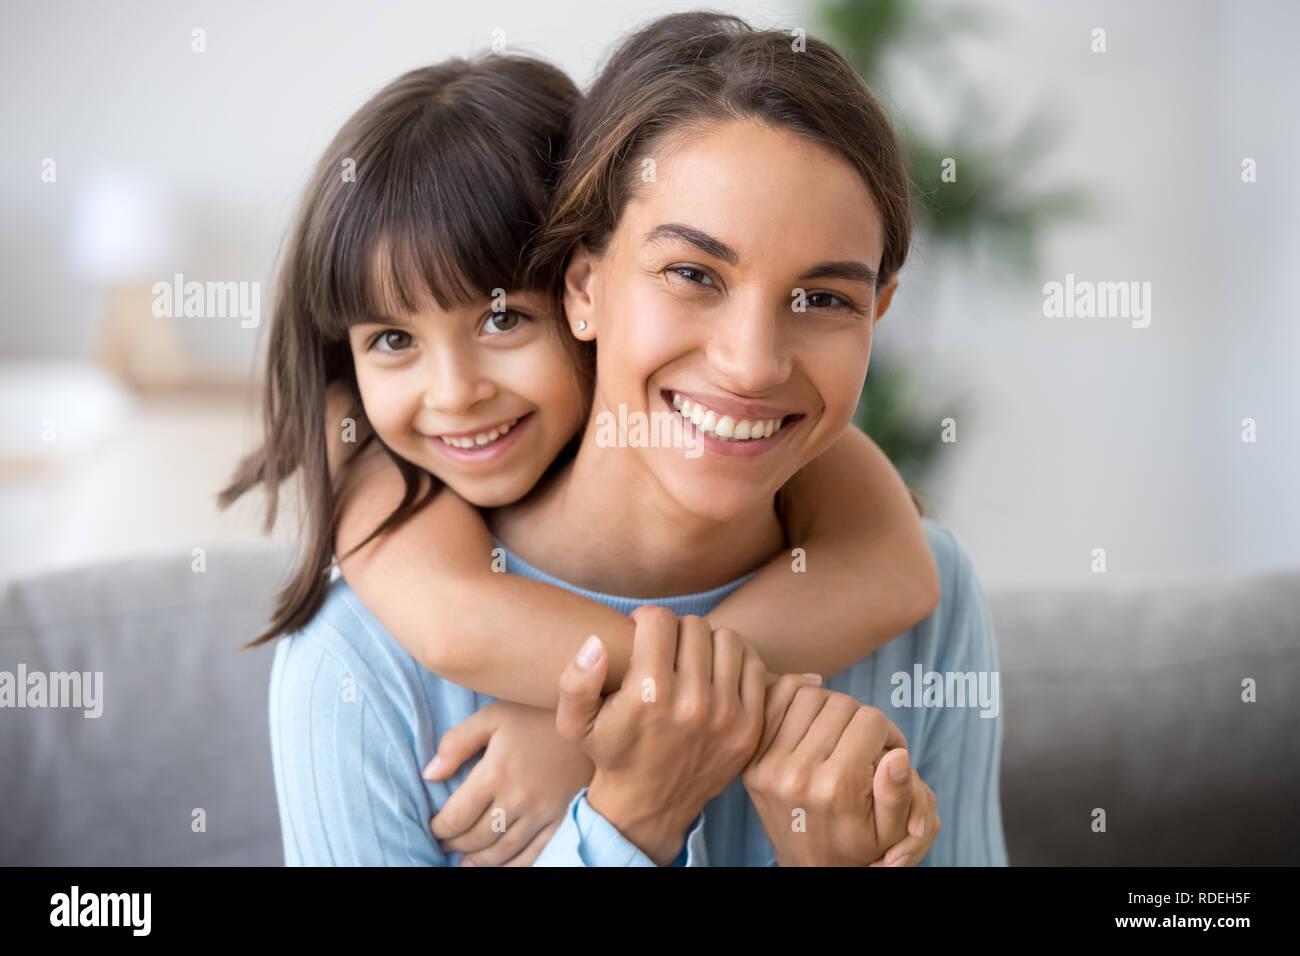 Happy mom and cute kid daughter embracing looking at camera - Stock Image